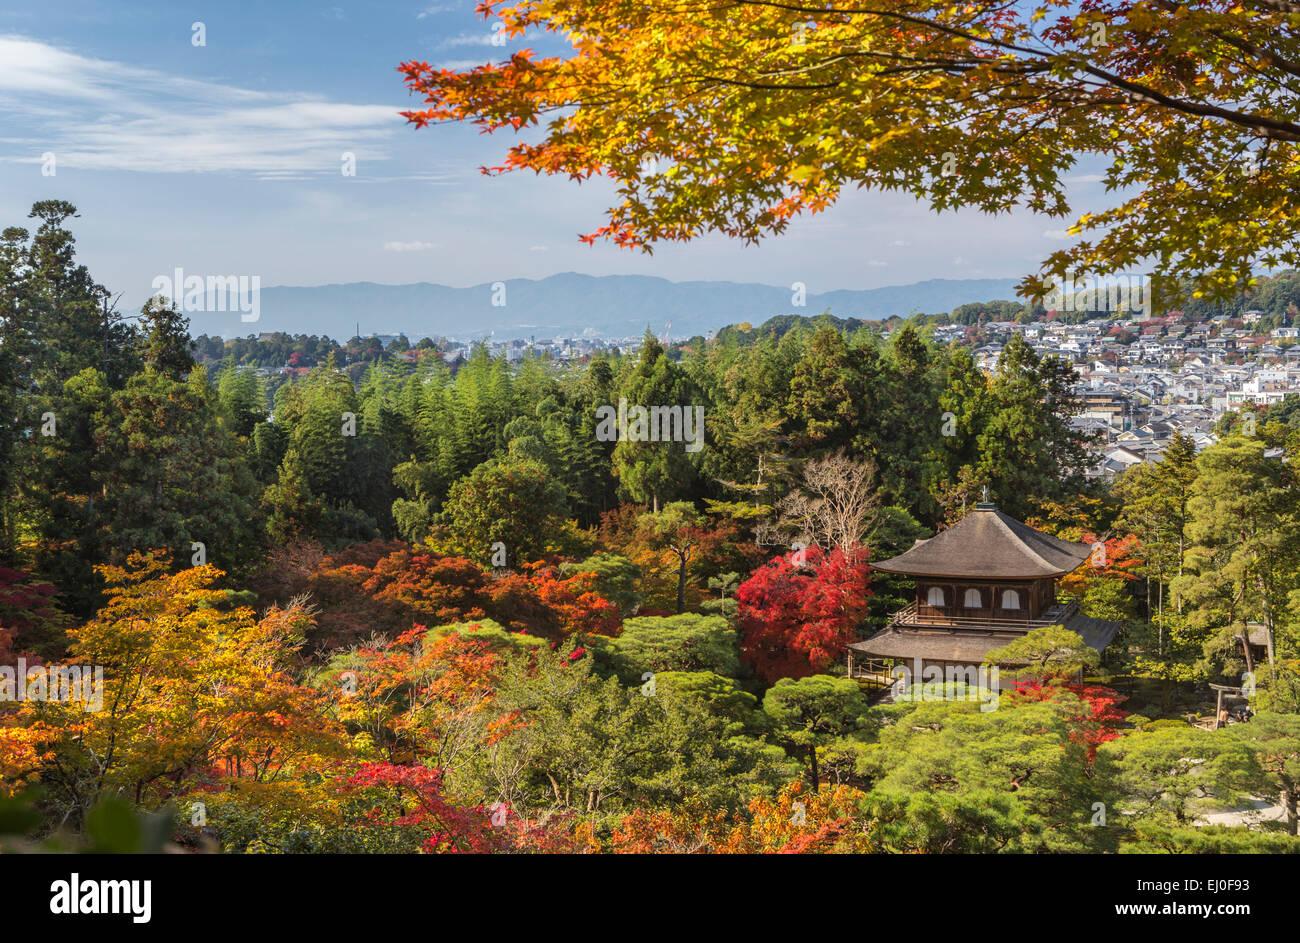 world heritage, Ginkaku-ji, Japan, Asia, Kansai, Kyoto, Japanese, Landscape, architecture, autumn, colourful, fall, - Stock Image